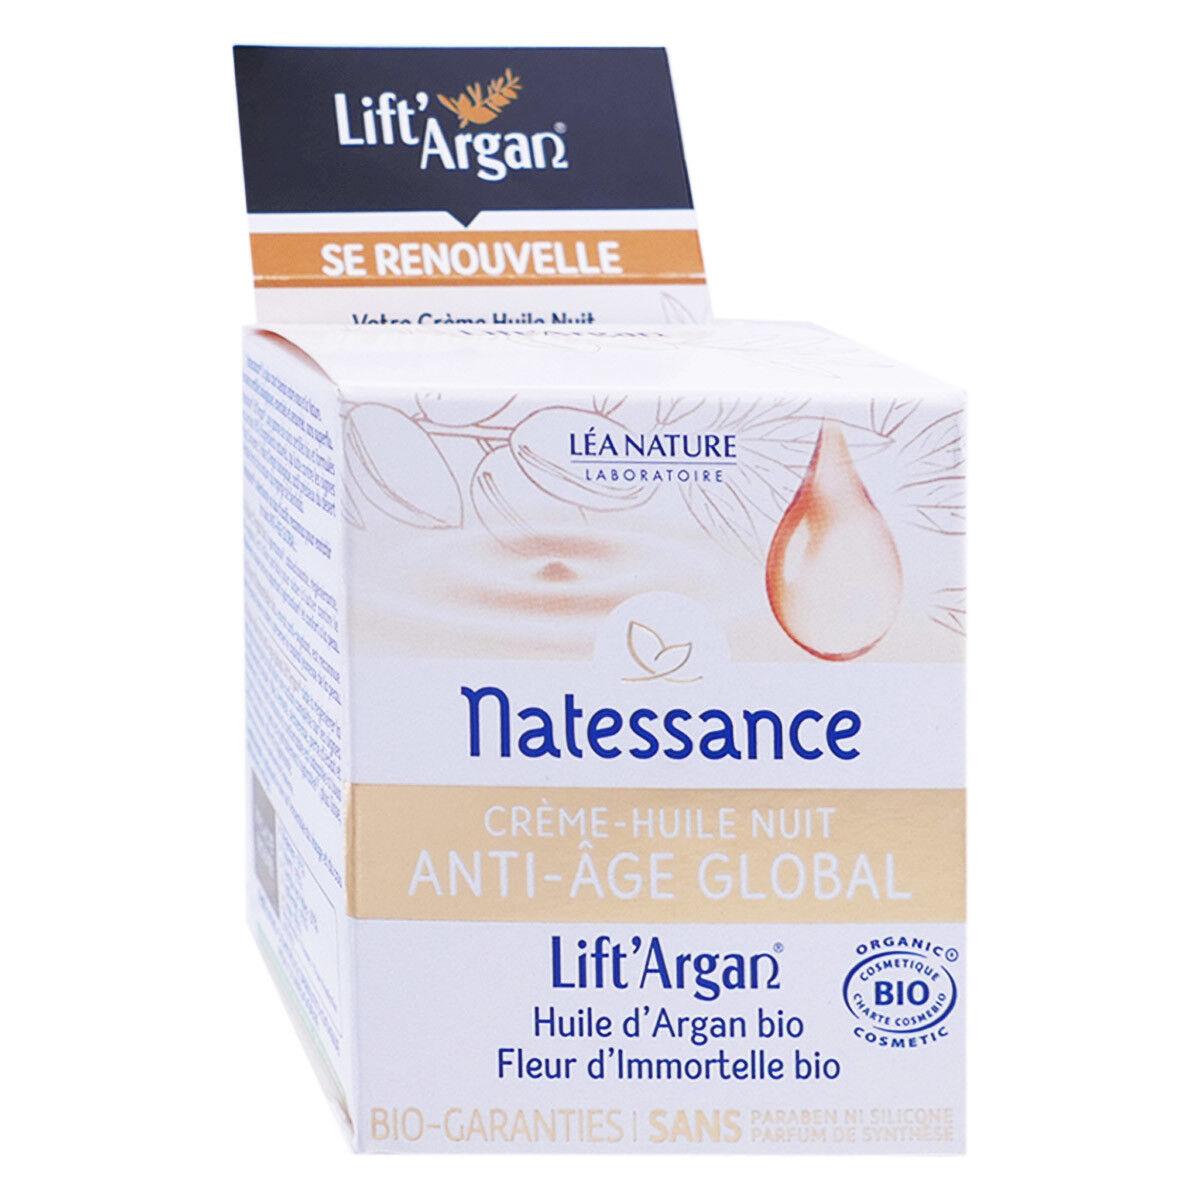 LIFT'ARGAN Lift argan  creme huile nuit anti age global50ml